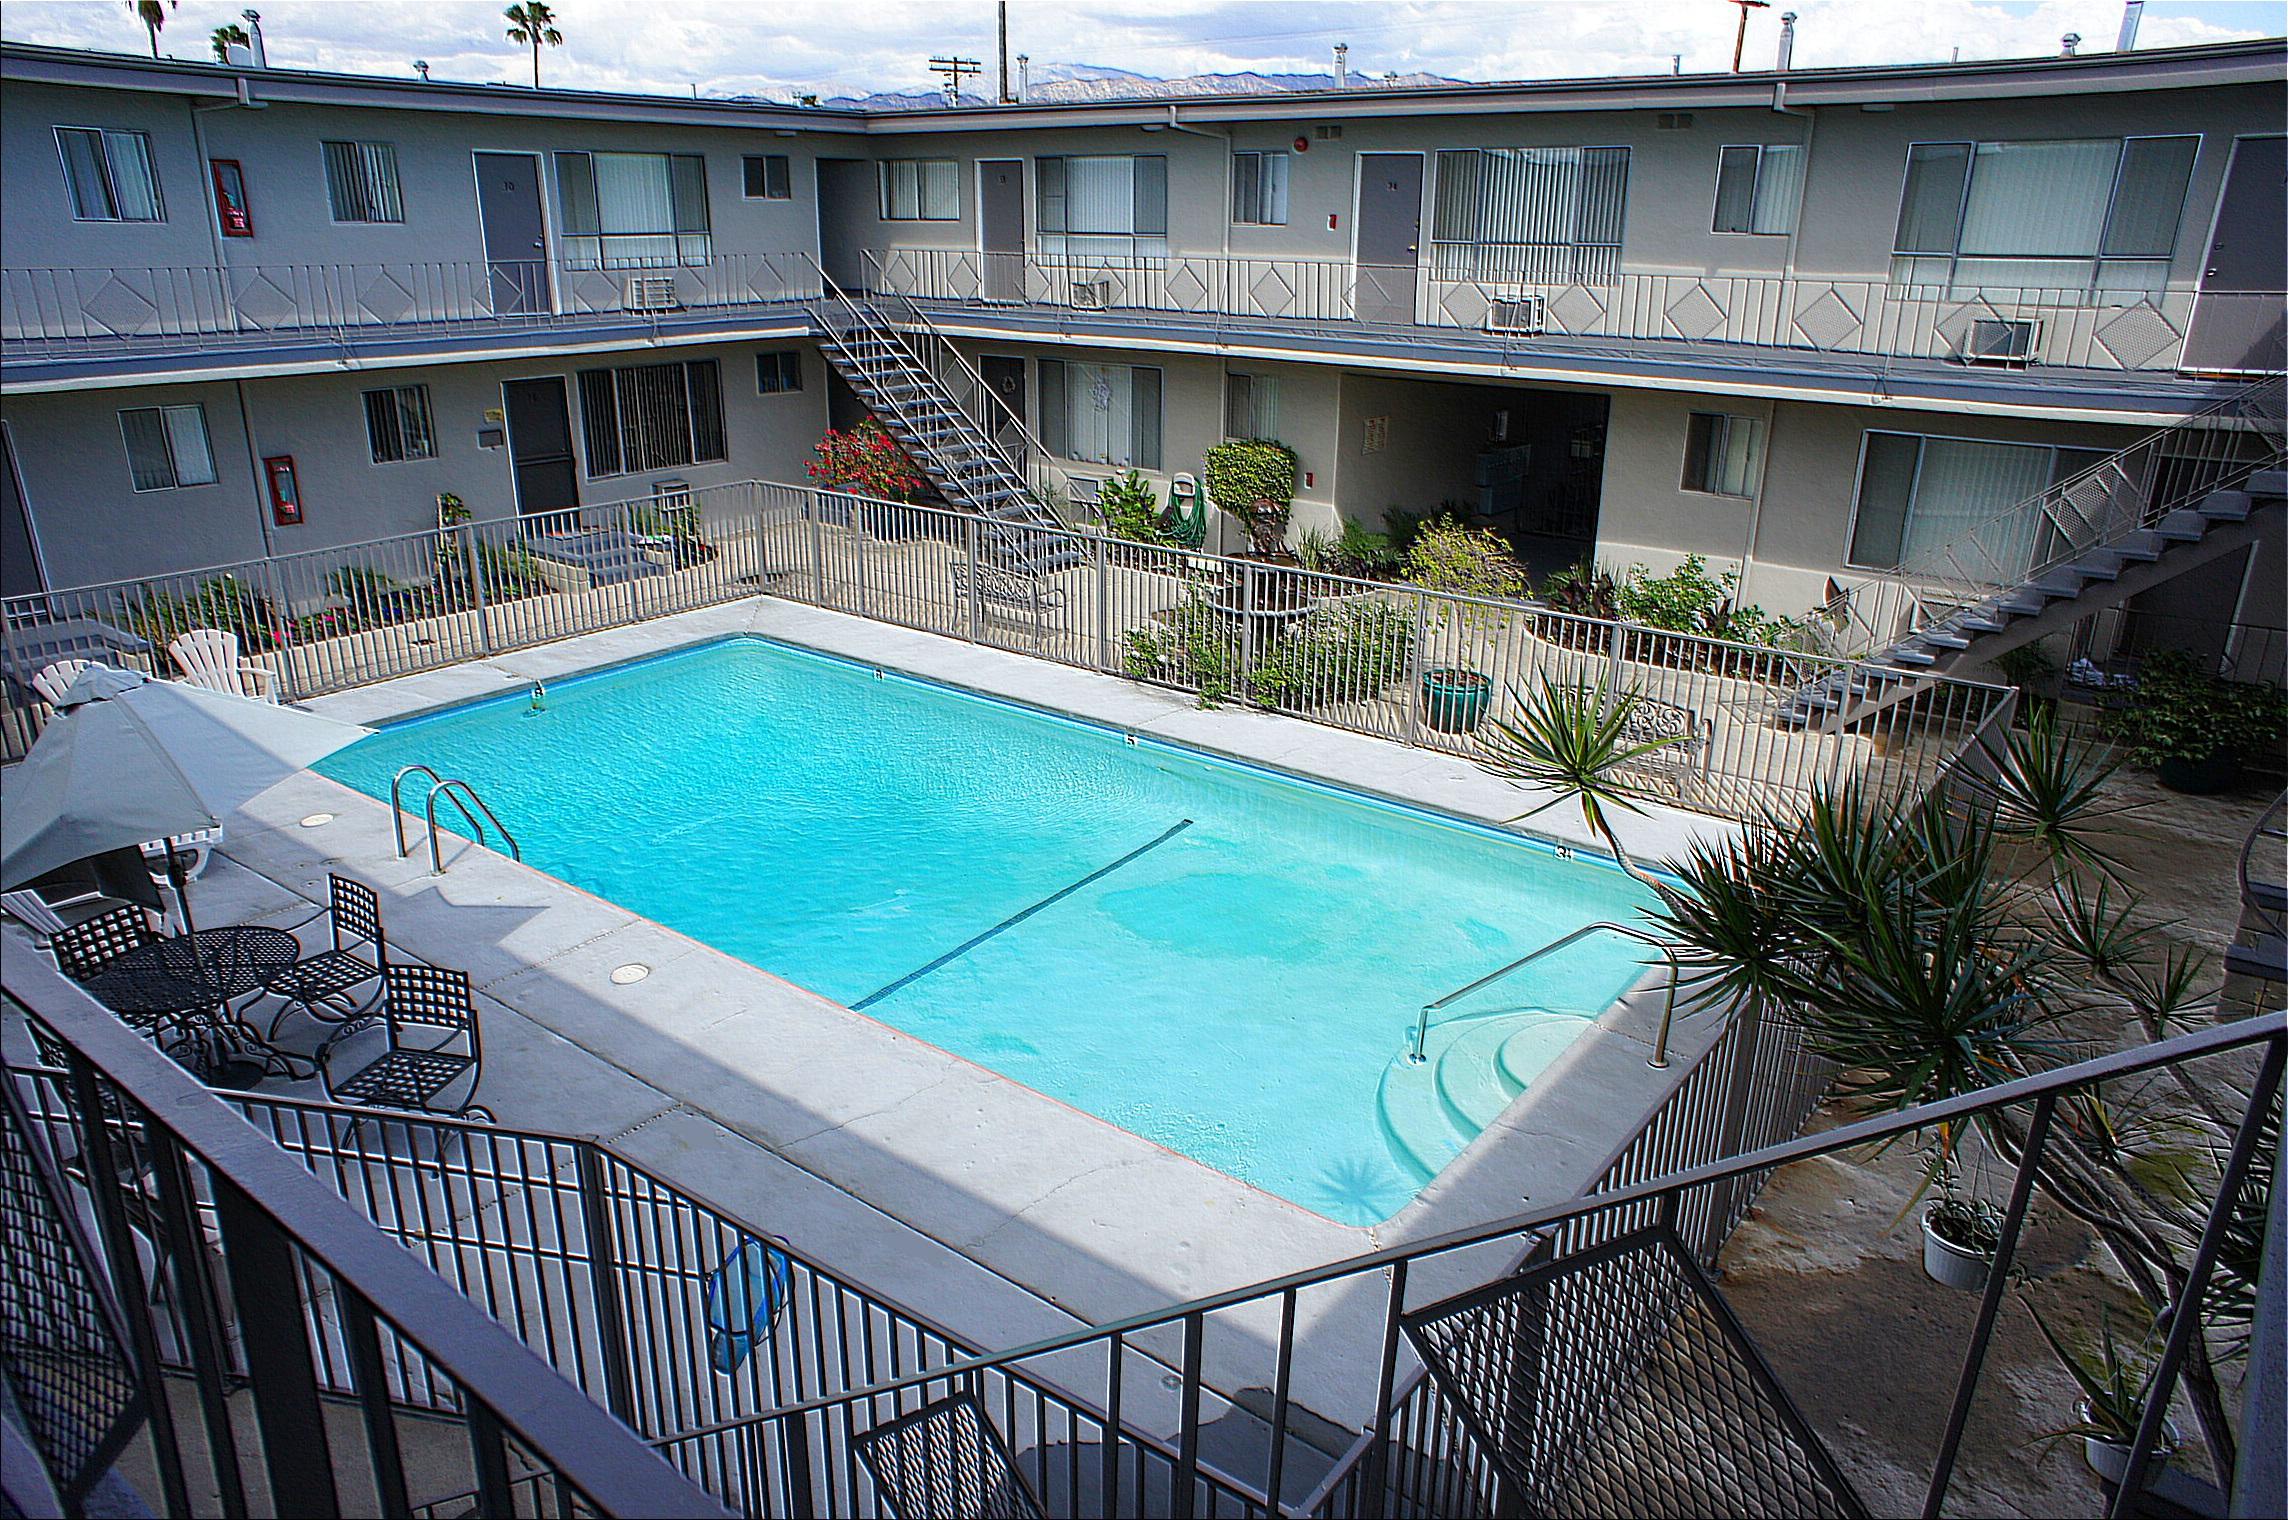 5715 Vineland Ave., North Hollywood, CA 91601